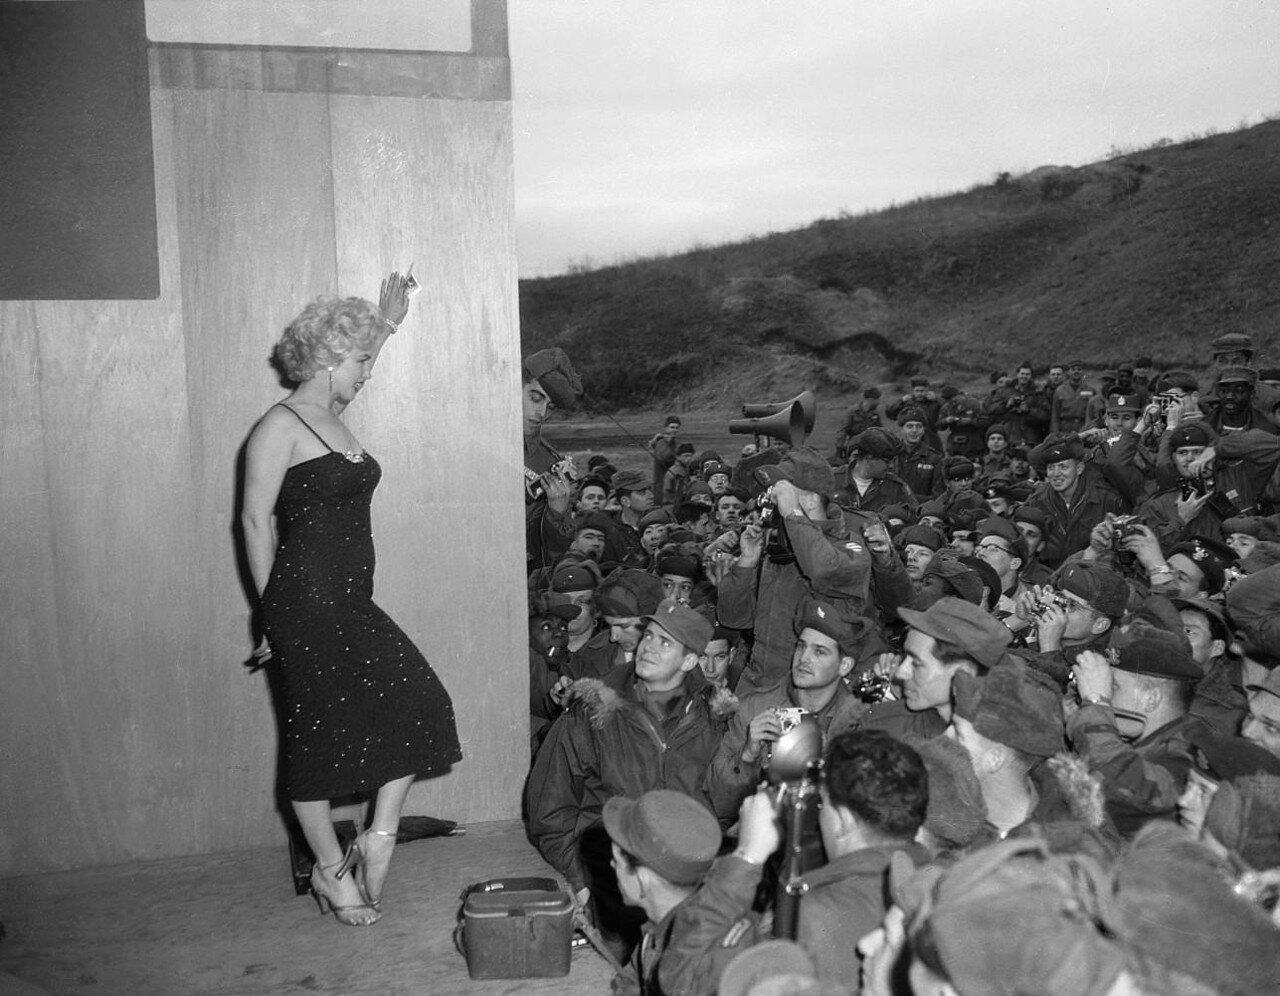 Marilyn Monroe Posing for Soldiers